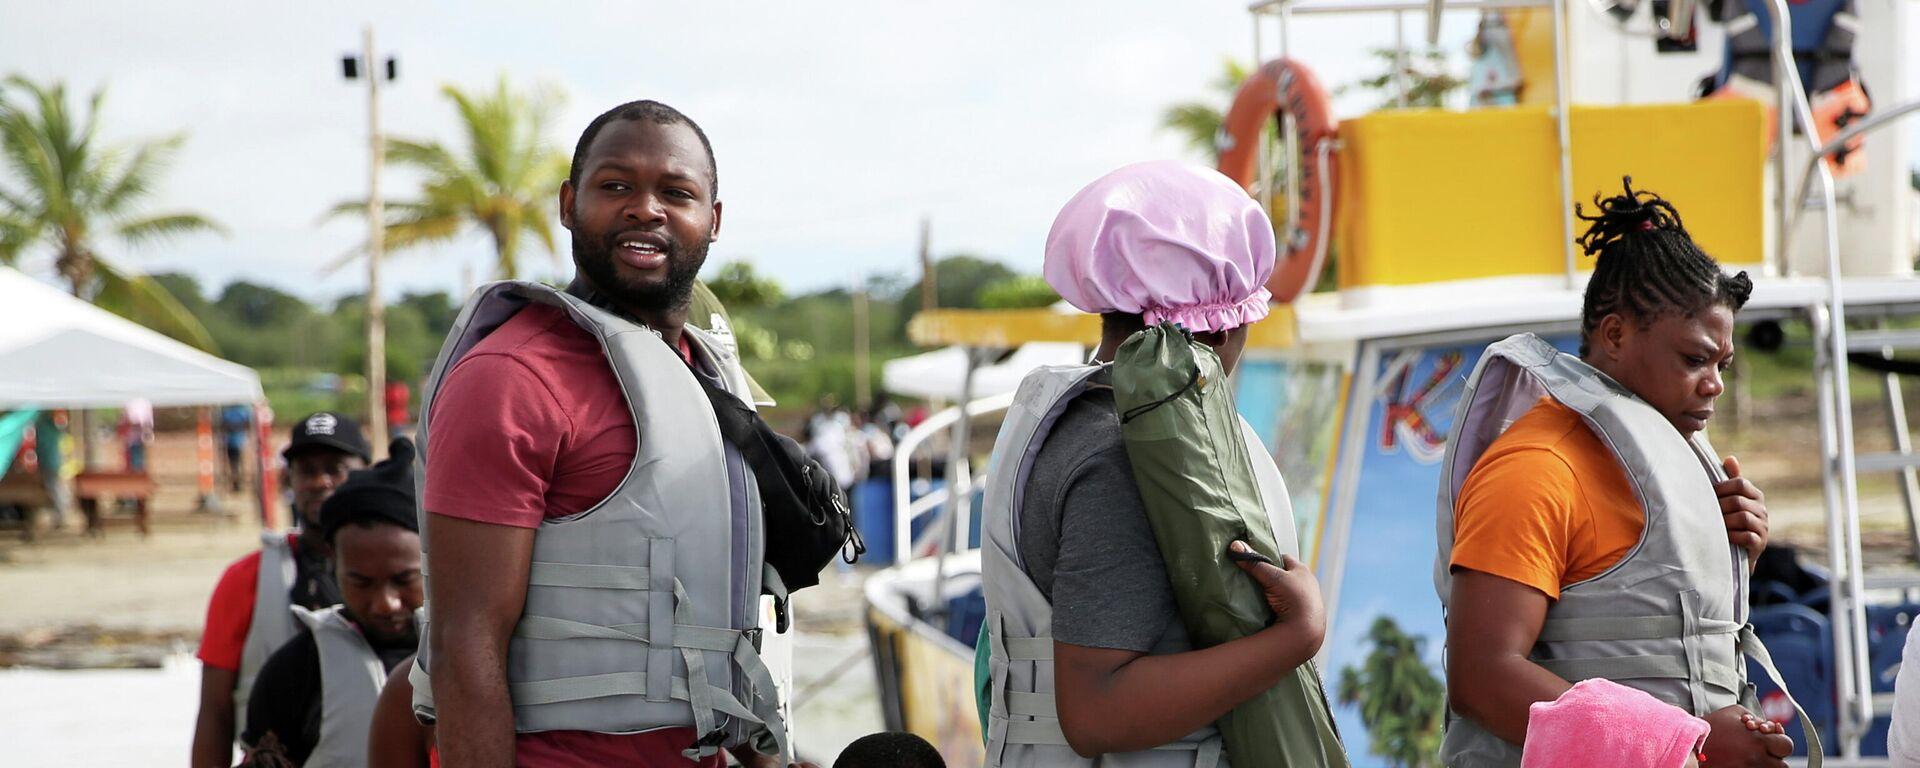 Migrantes haitianos - Sputnik Mundo, 1920, 06.10.2021